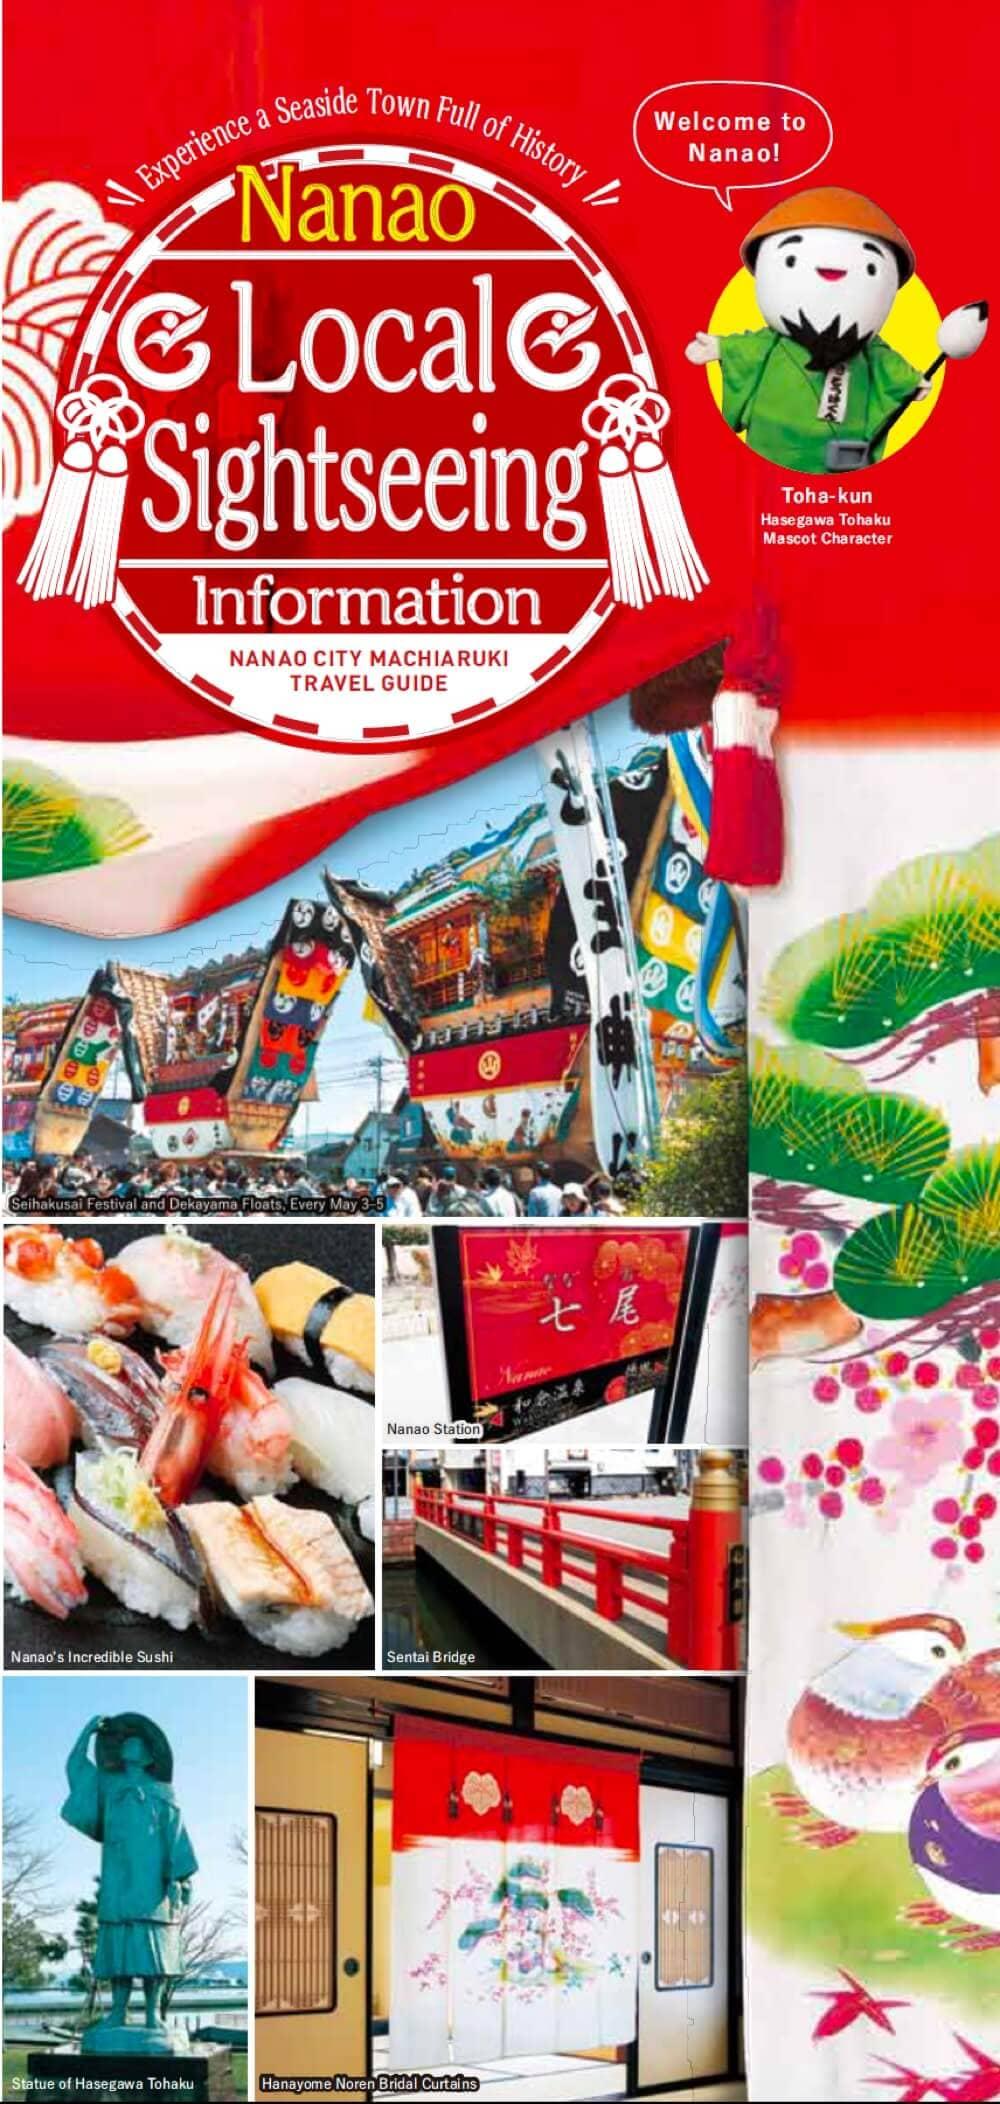 Nanao-Local-Sightseeing-Information